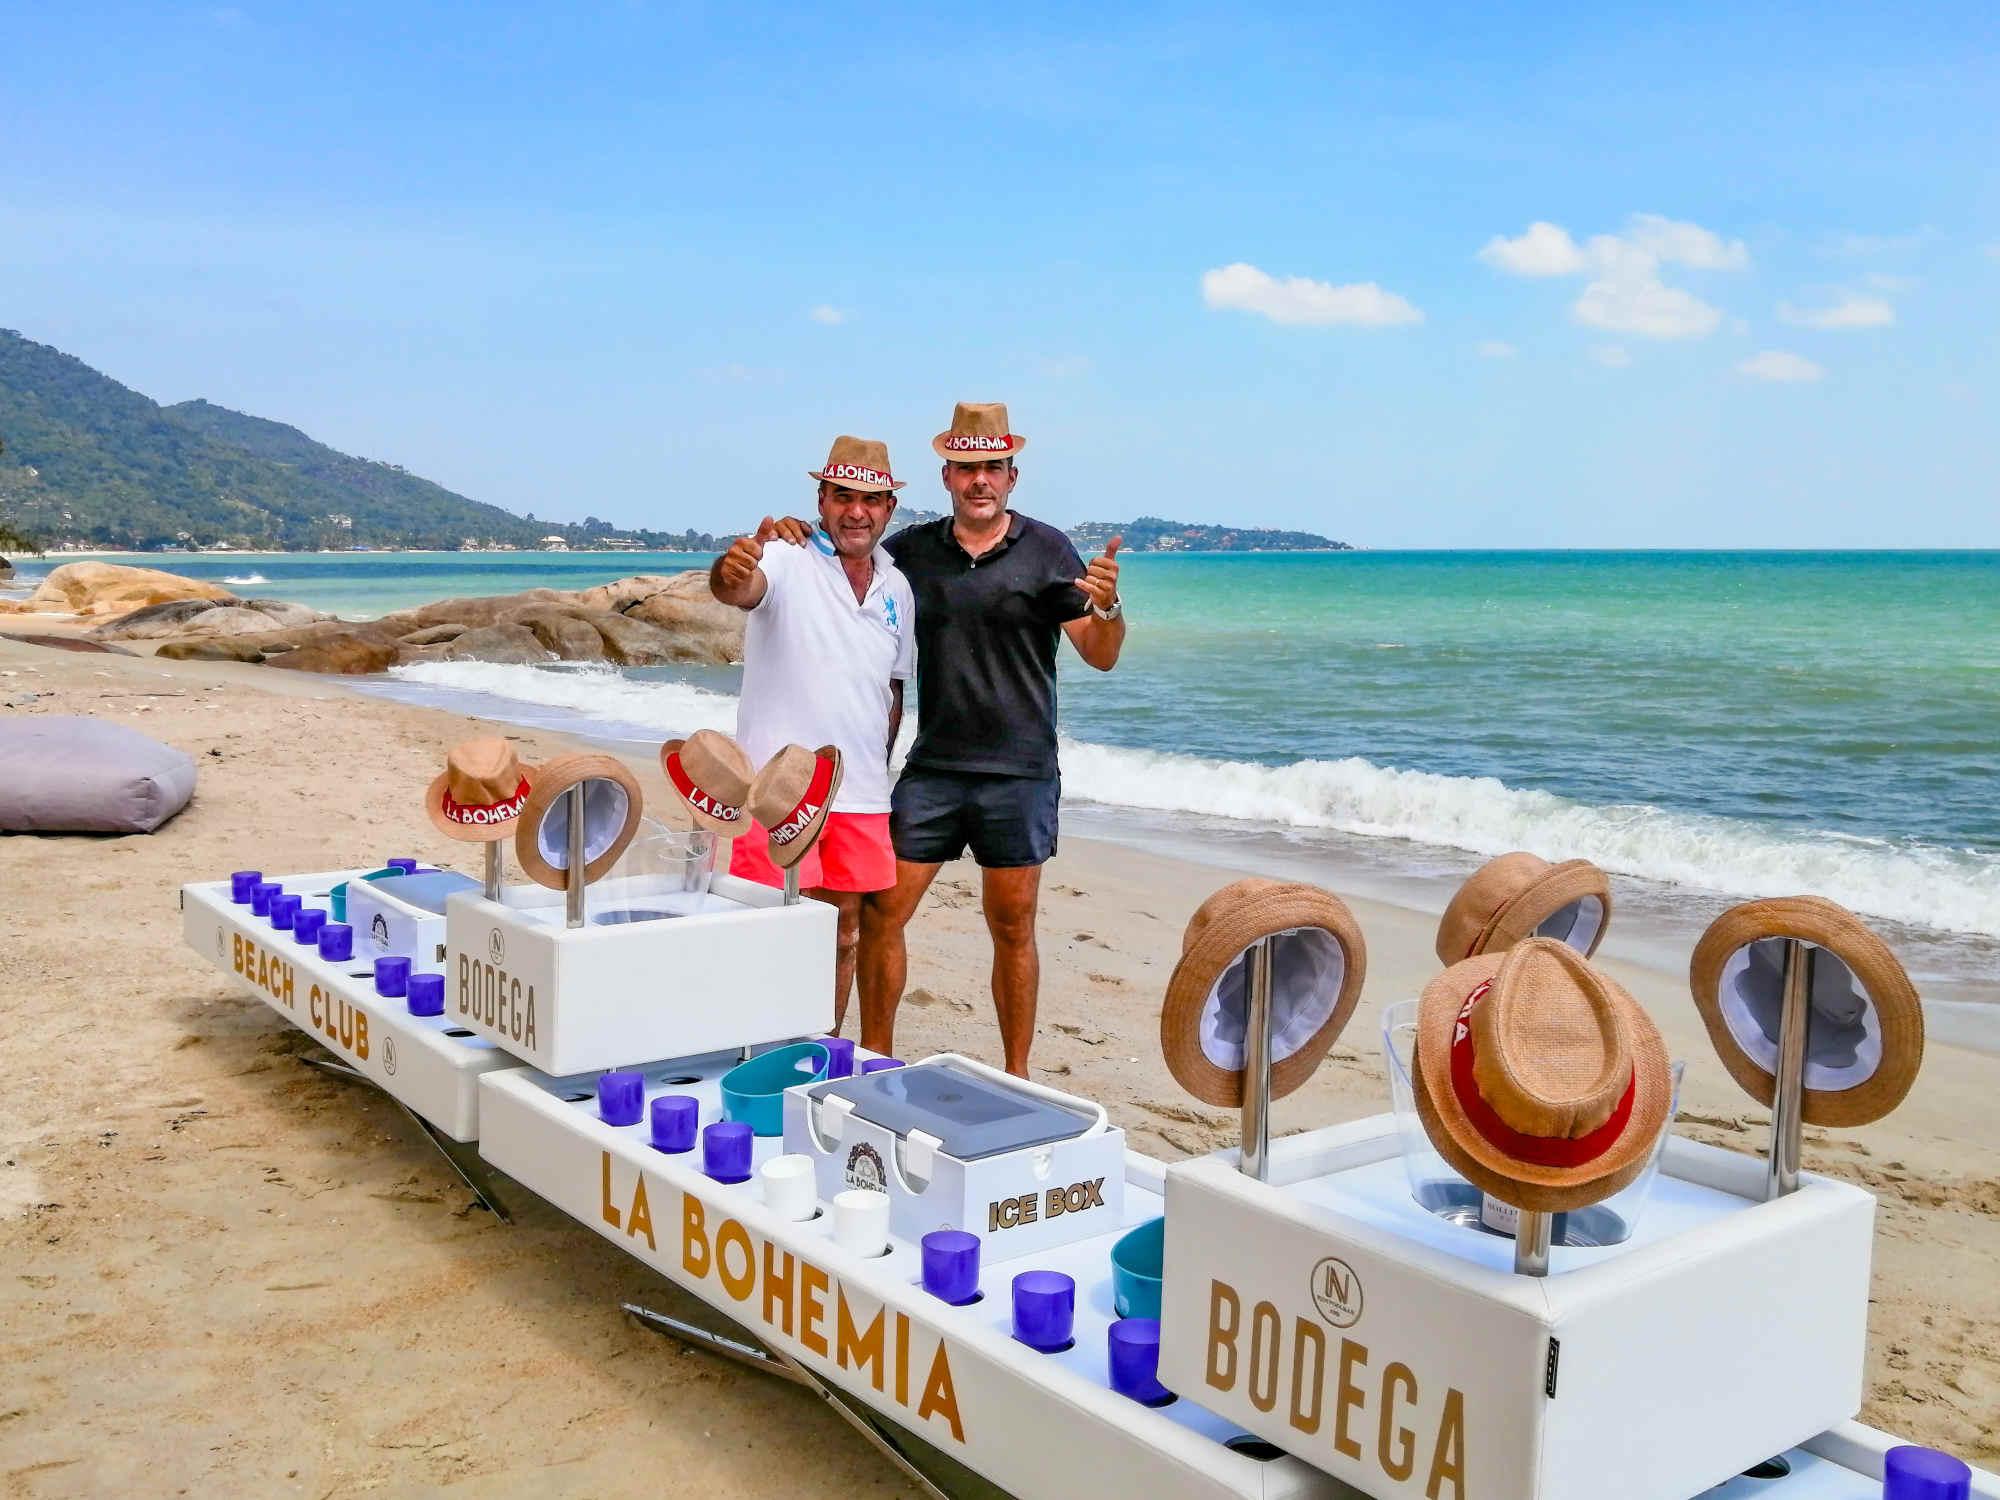 Plus grand bar flottant pour piscine de Thailande de N'Jpy PoolBar a La Bohemia Beach, Beach Club Koh Samui.